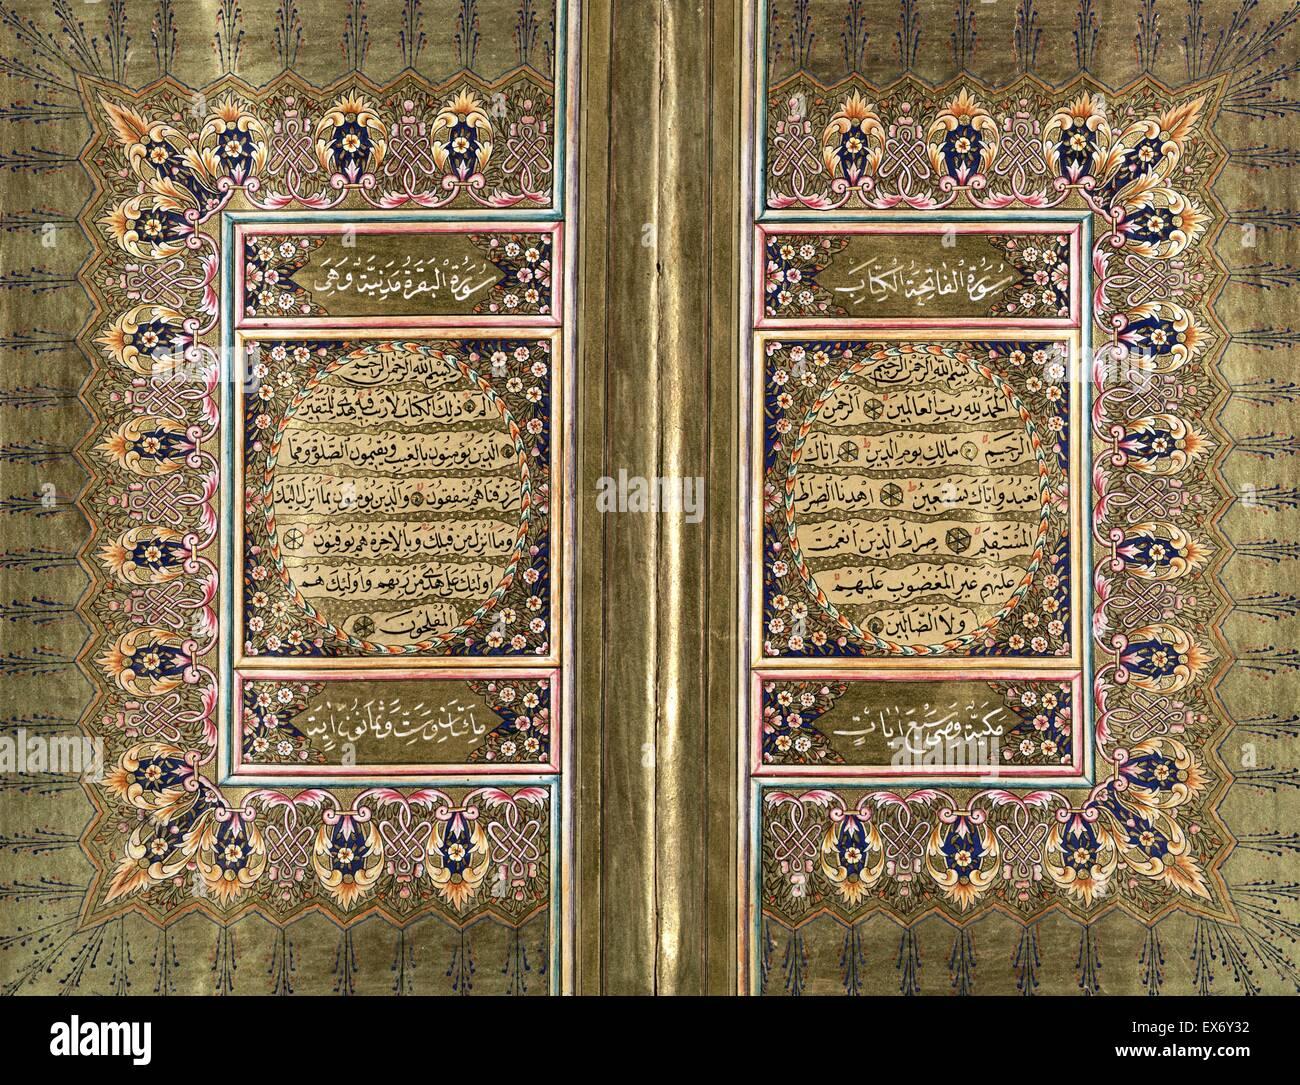 Ottoman Qur'an from 1869, written by Hajj Muhammad Sharif al-Ramzi, who was a student of Muhammad al-Hilmi. - Stock Image